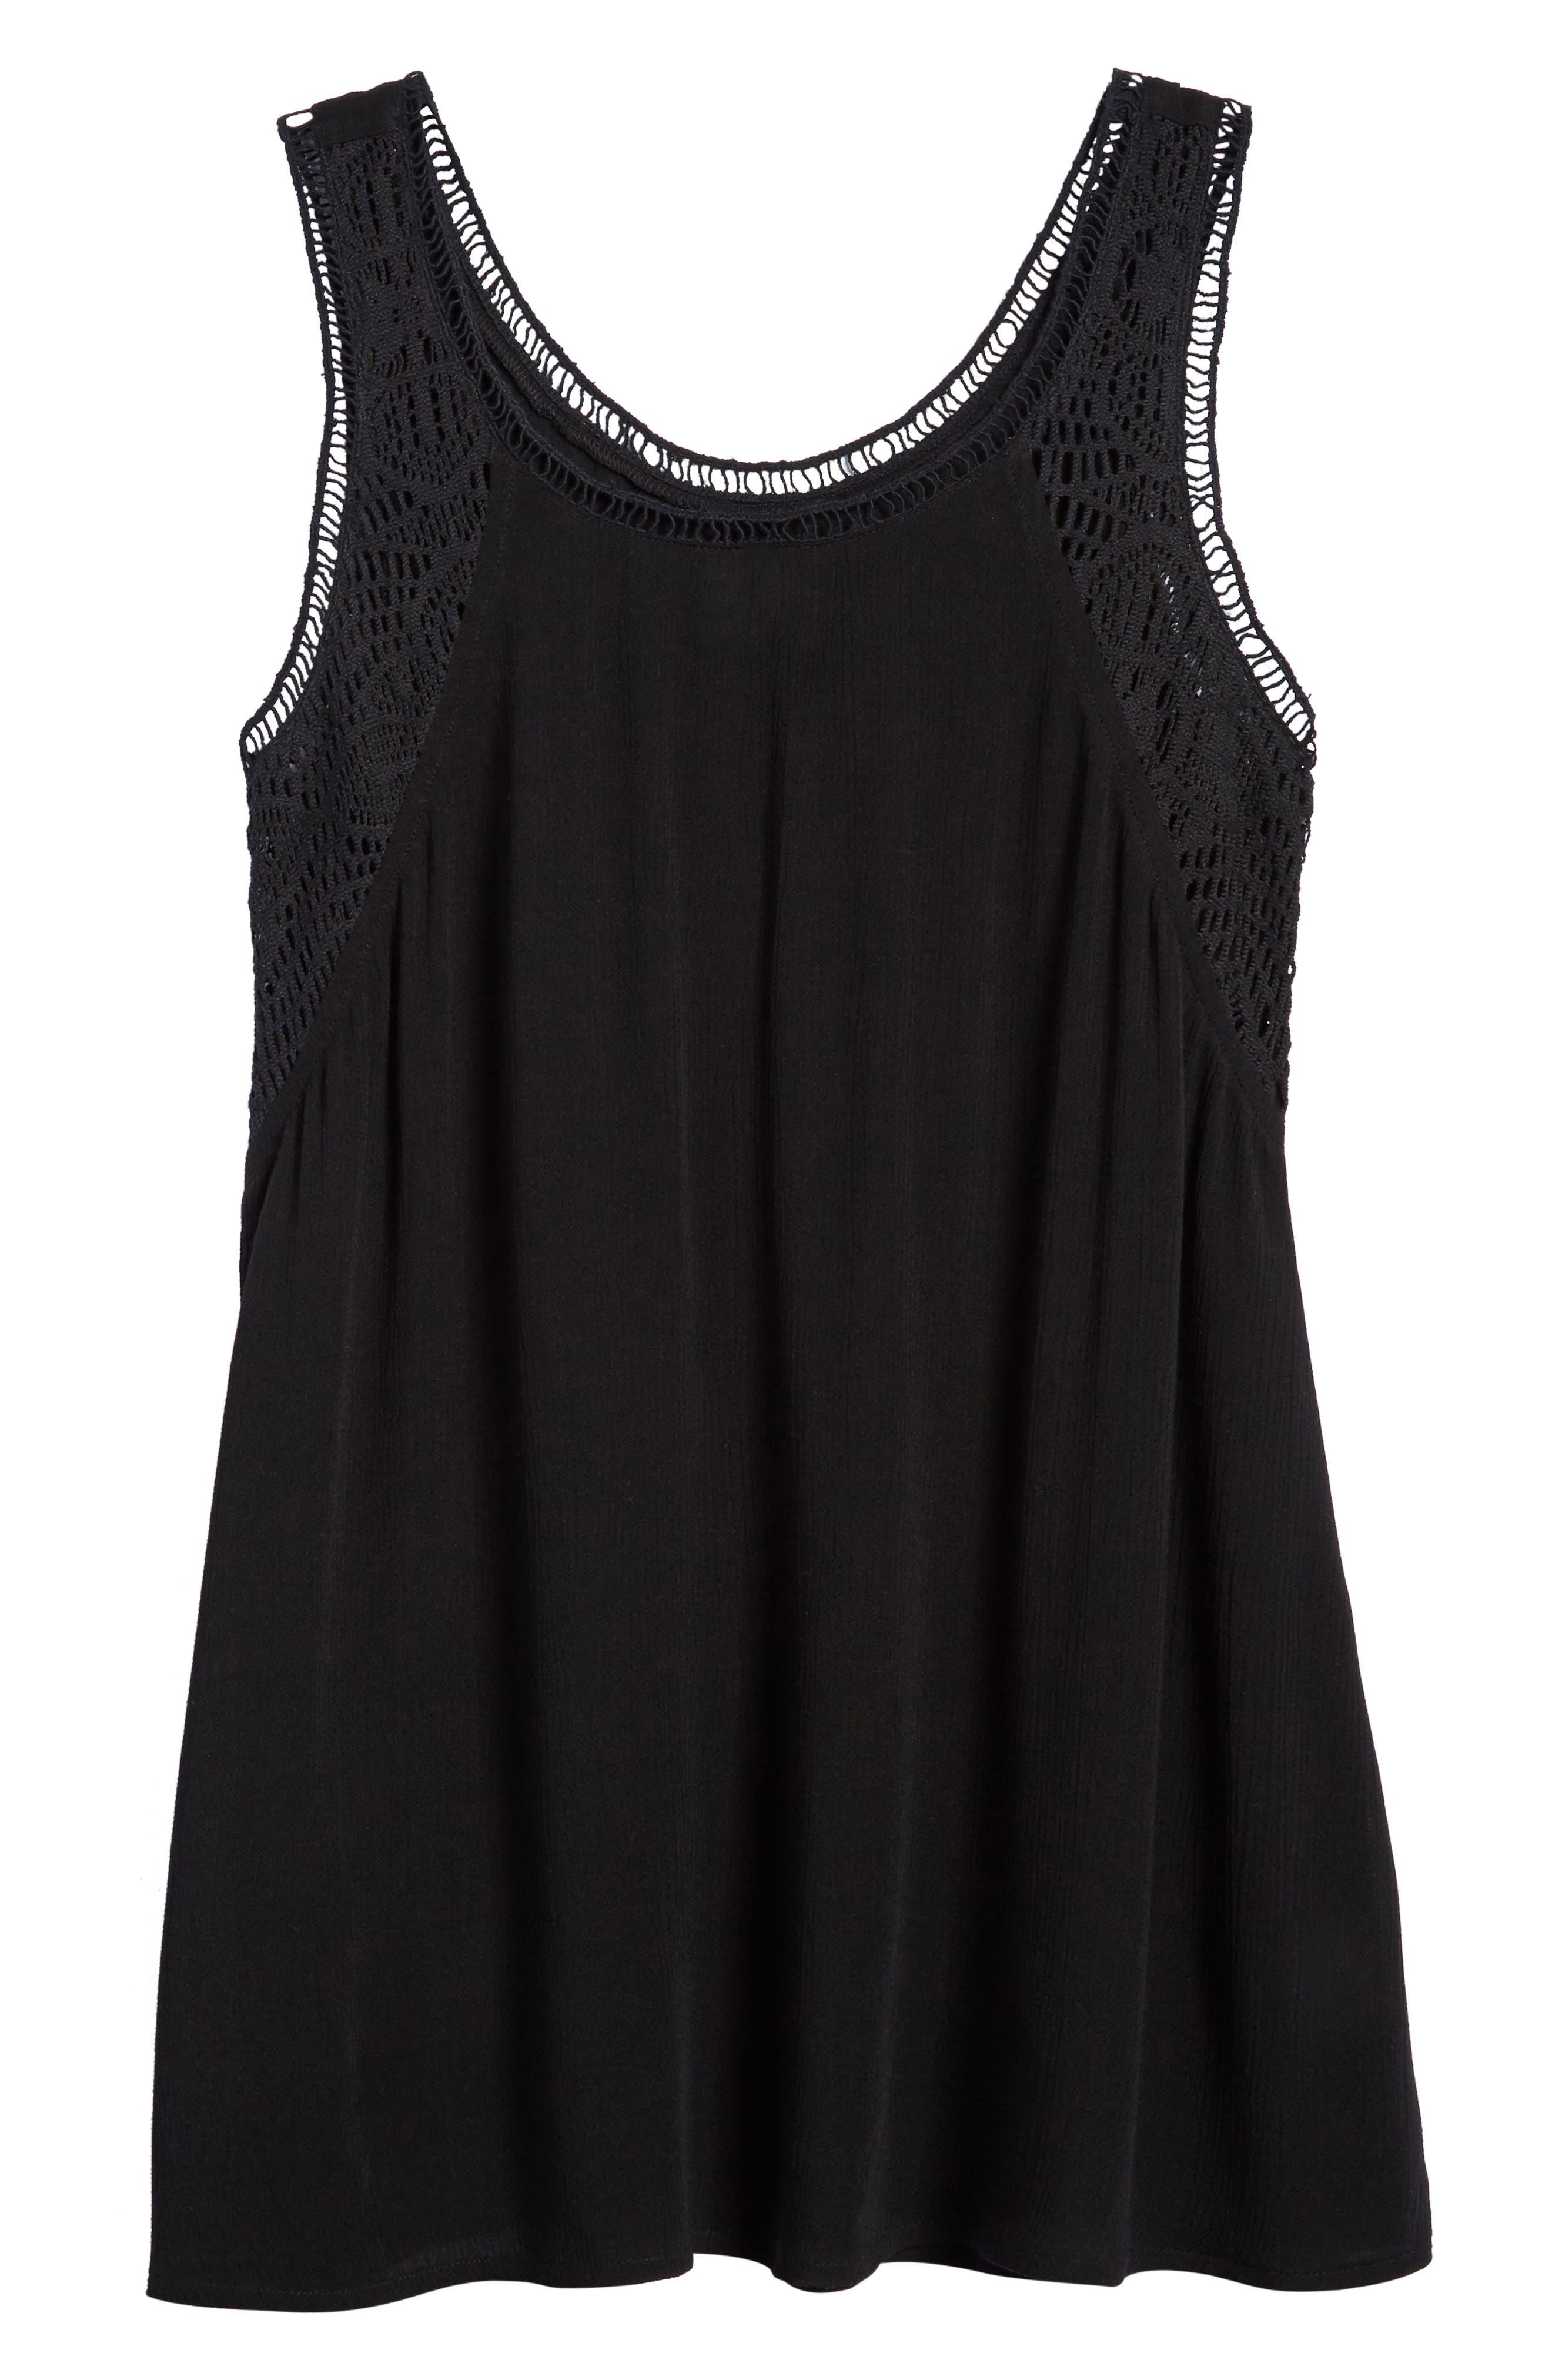 Main Image - O'Neill Addilyn Crochet Cover-Up Dress (Big Girls)